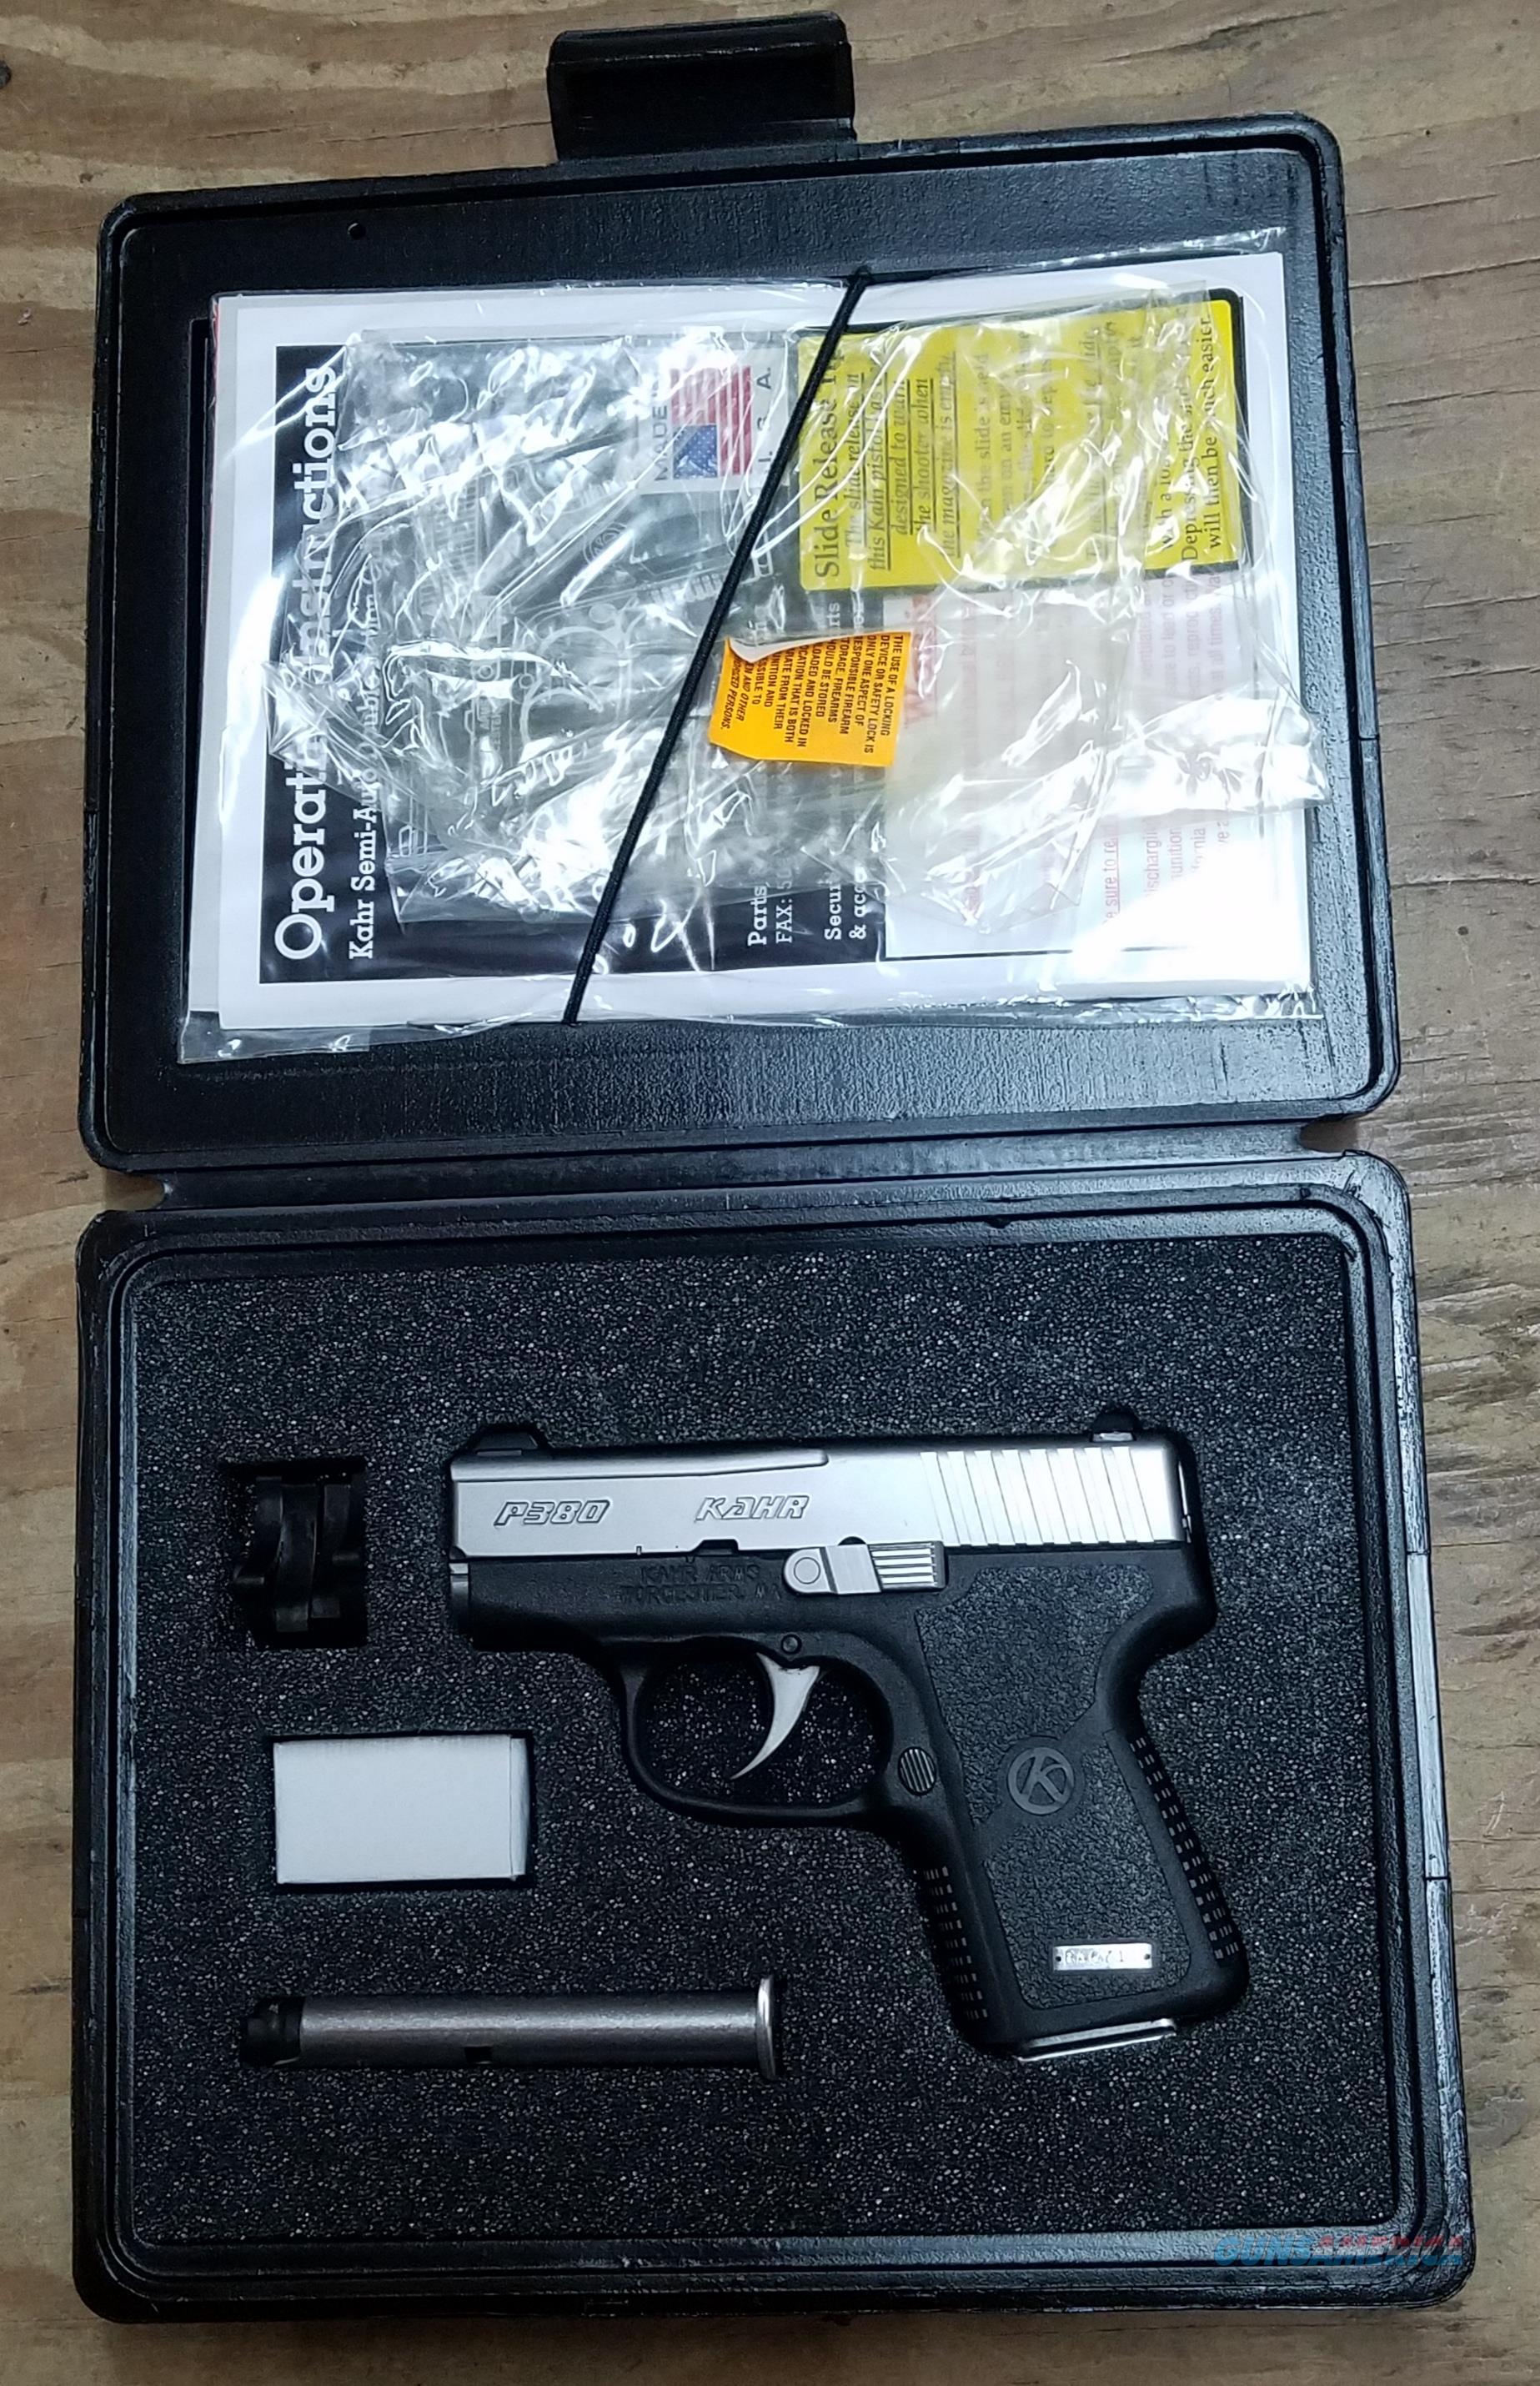 Kahr Arms P380 KP3833 .380ACP  Pistol  Guns > Pistols > Kahr Pistols